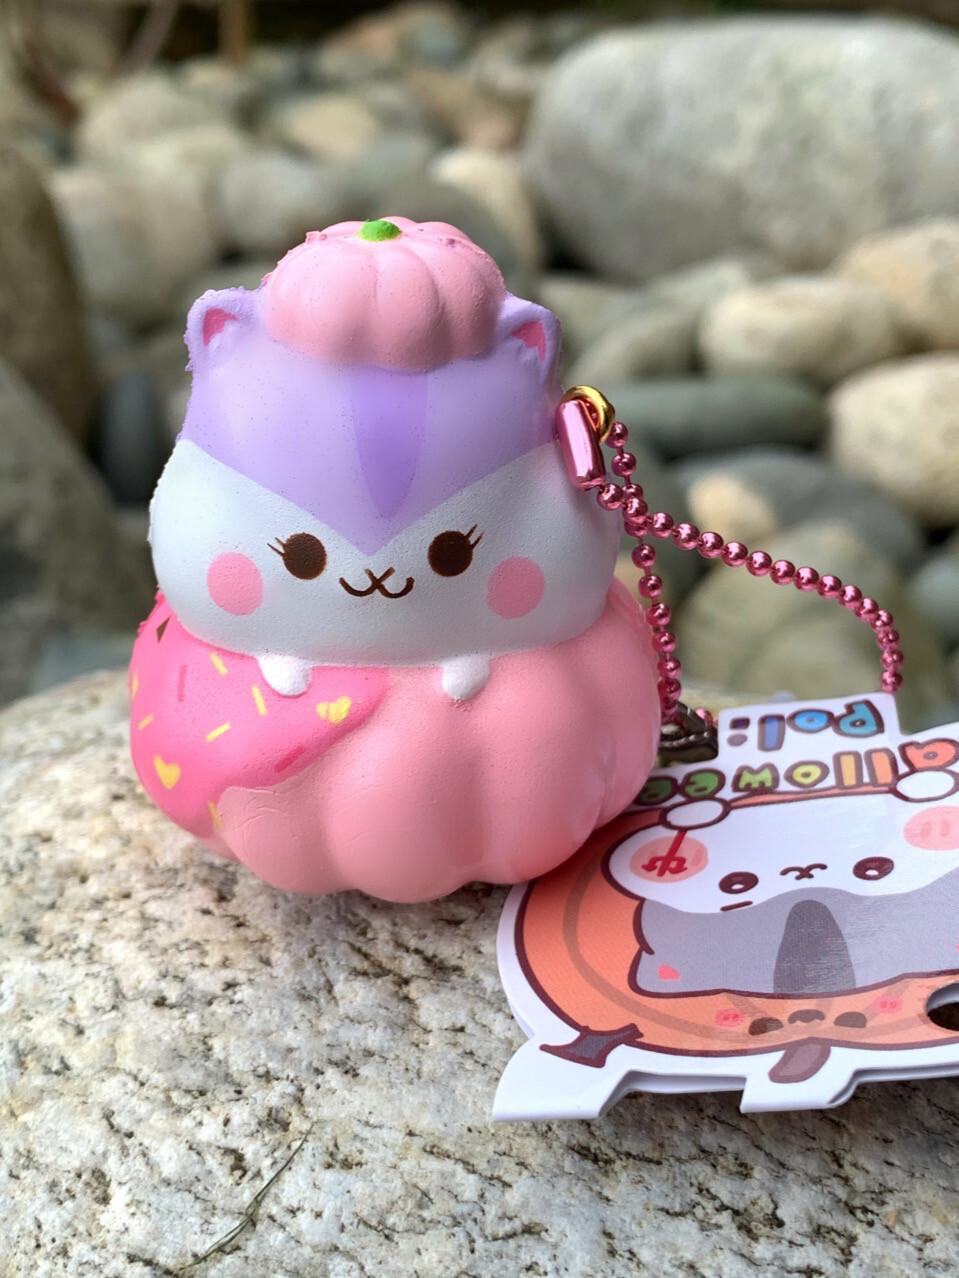 Poli Hamster Strawberry Pumpkin Squishy Toy